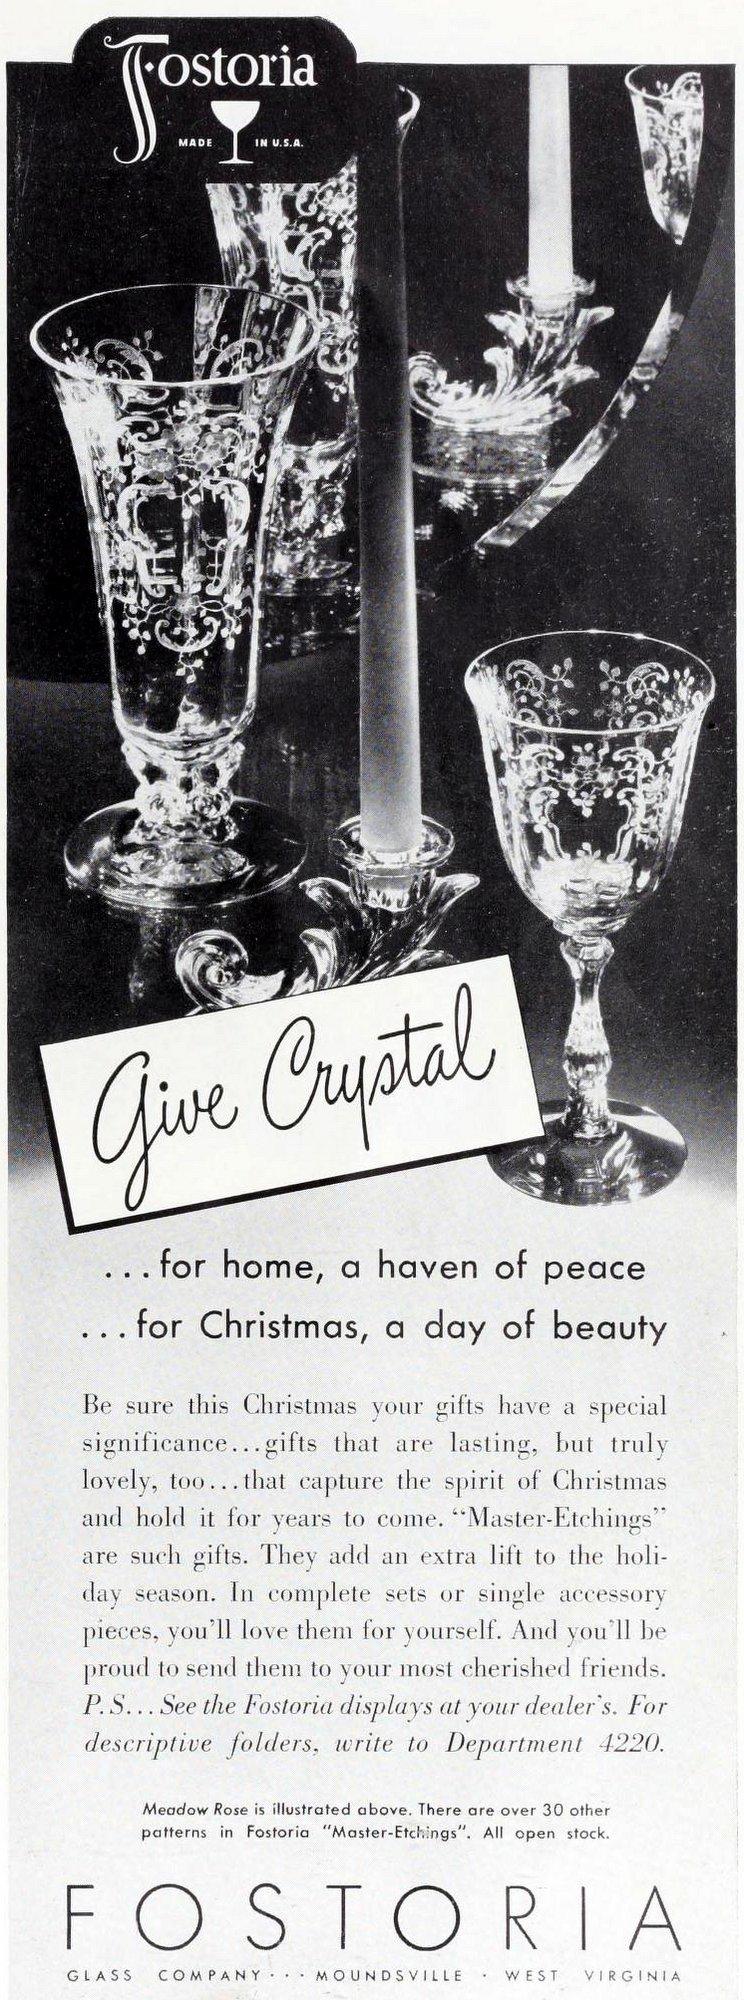 1940s Fostoria glassware from 1942 (2)